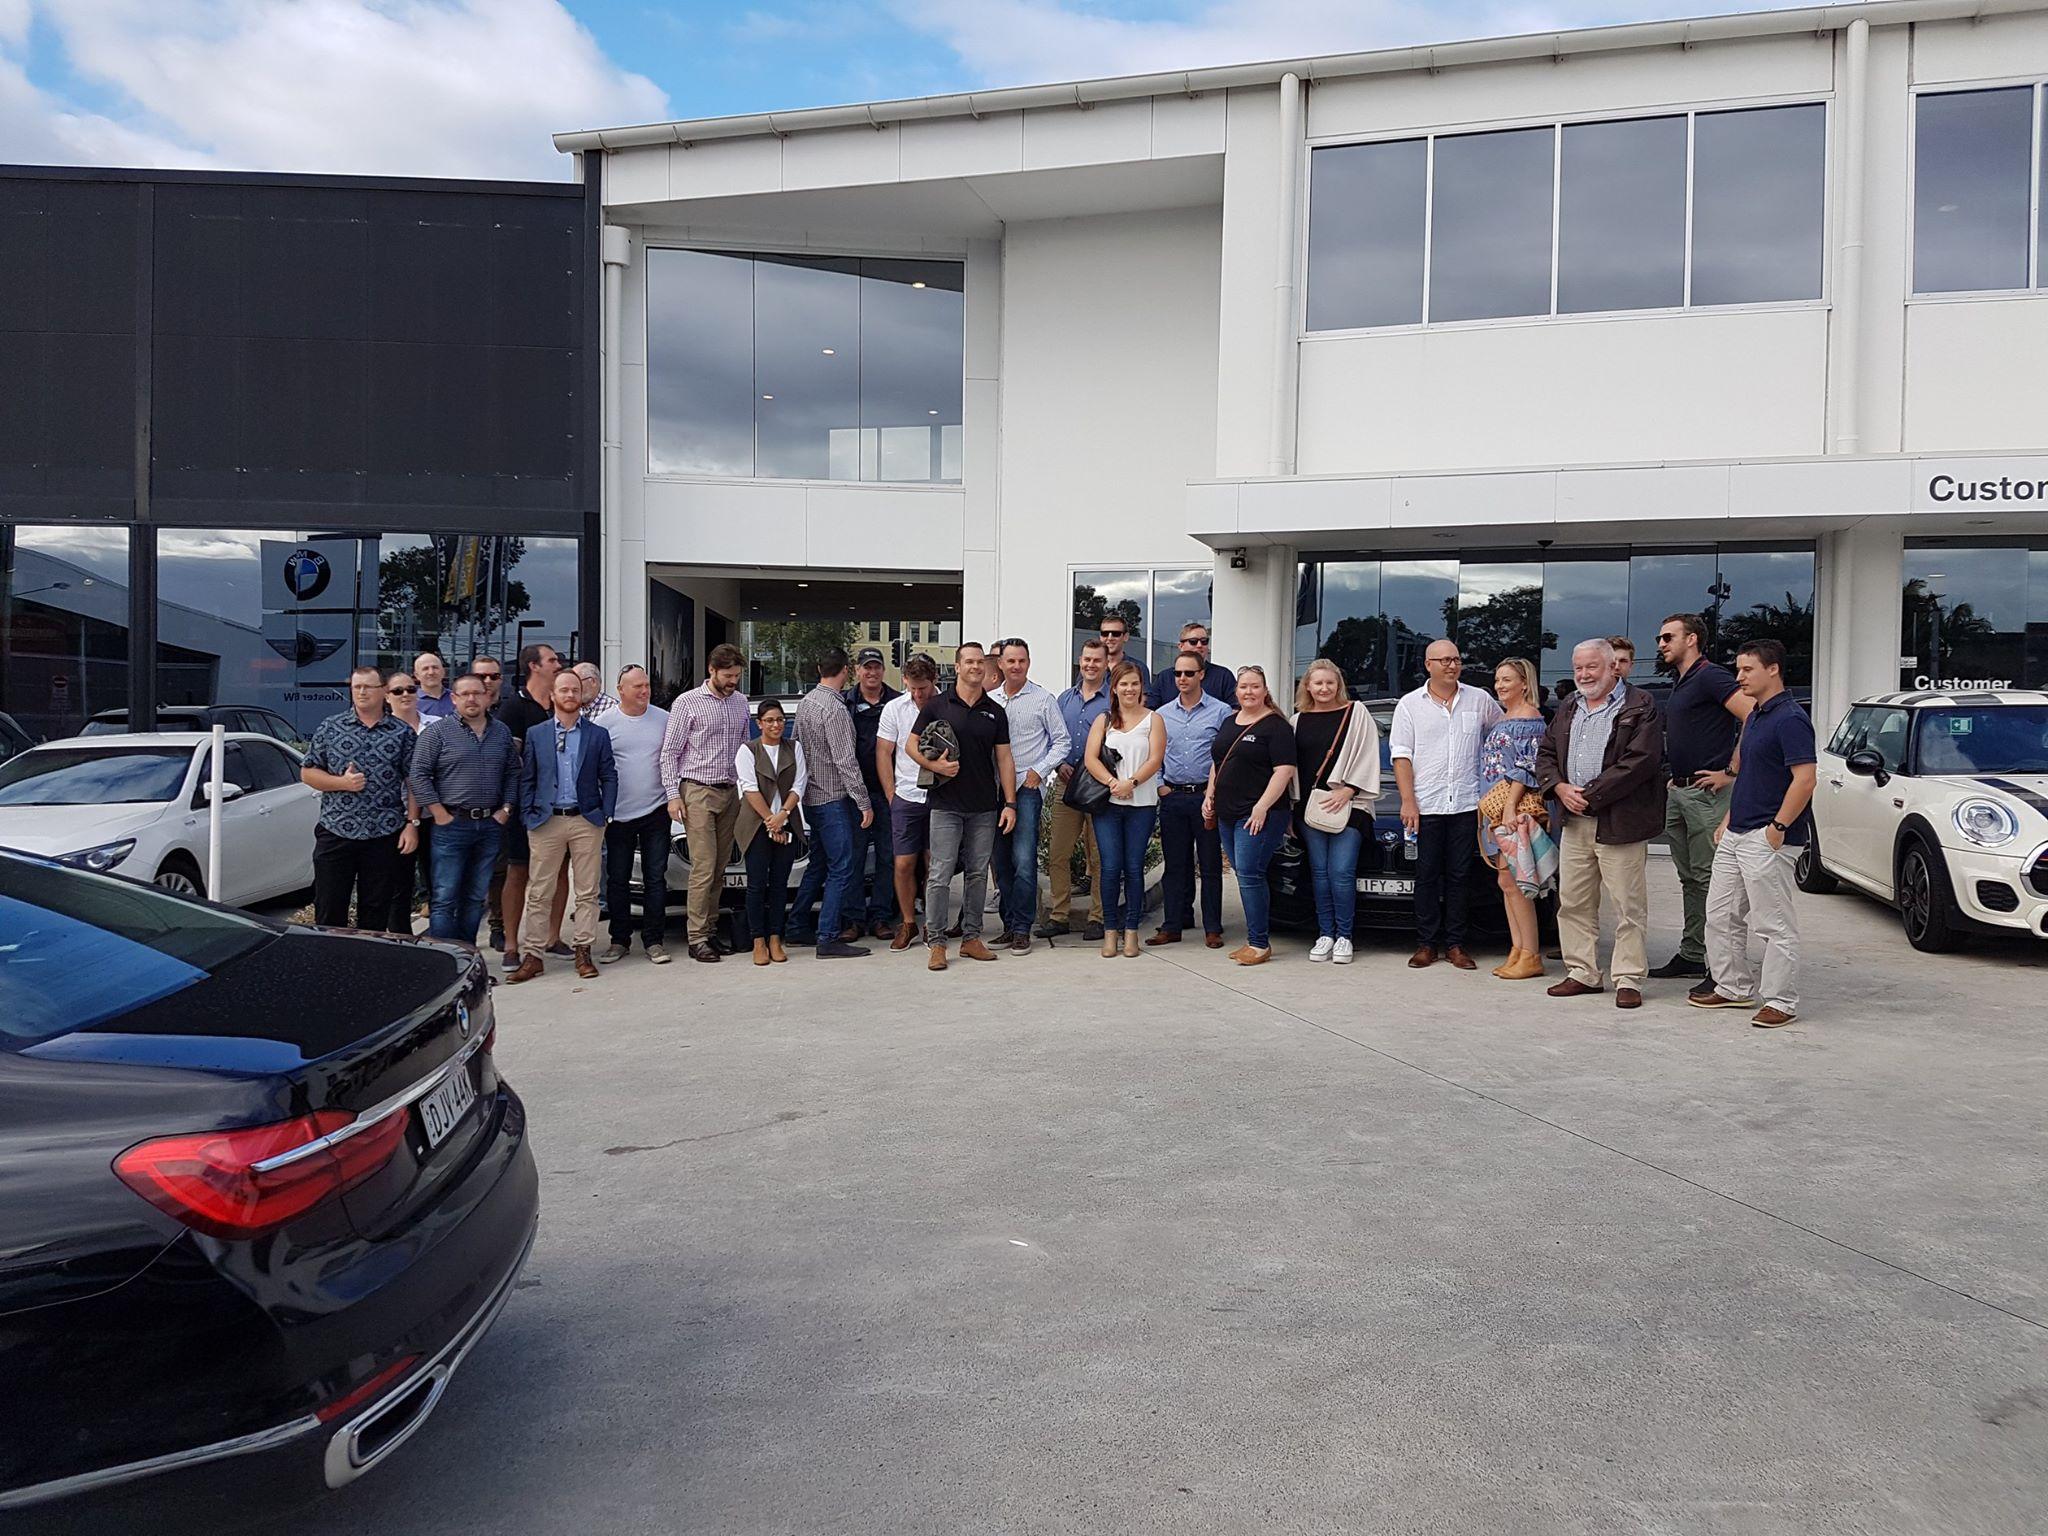 2017 BMW Suppliers Tour